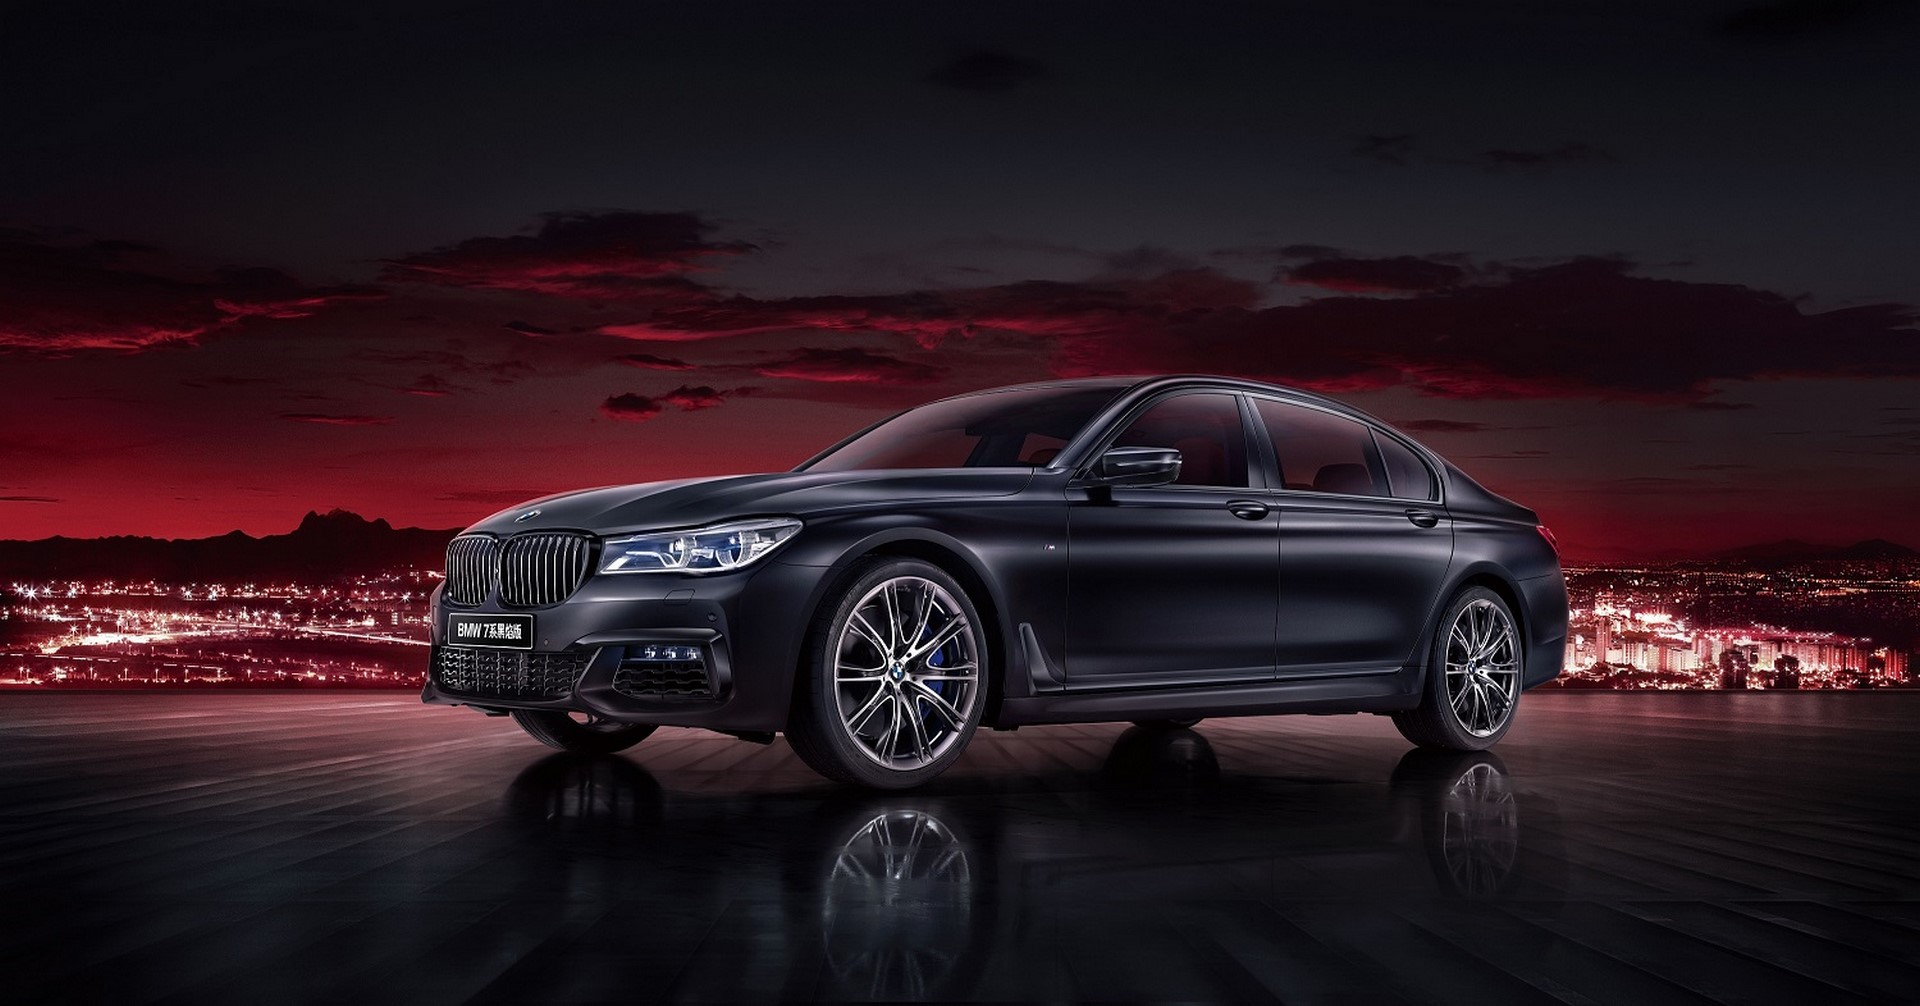 BMW 7-Series Black Fire Edition (1)